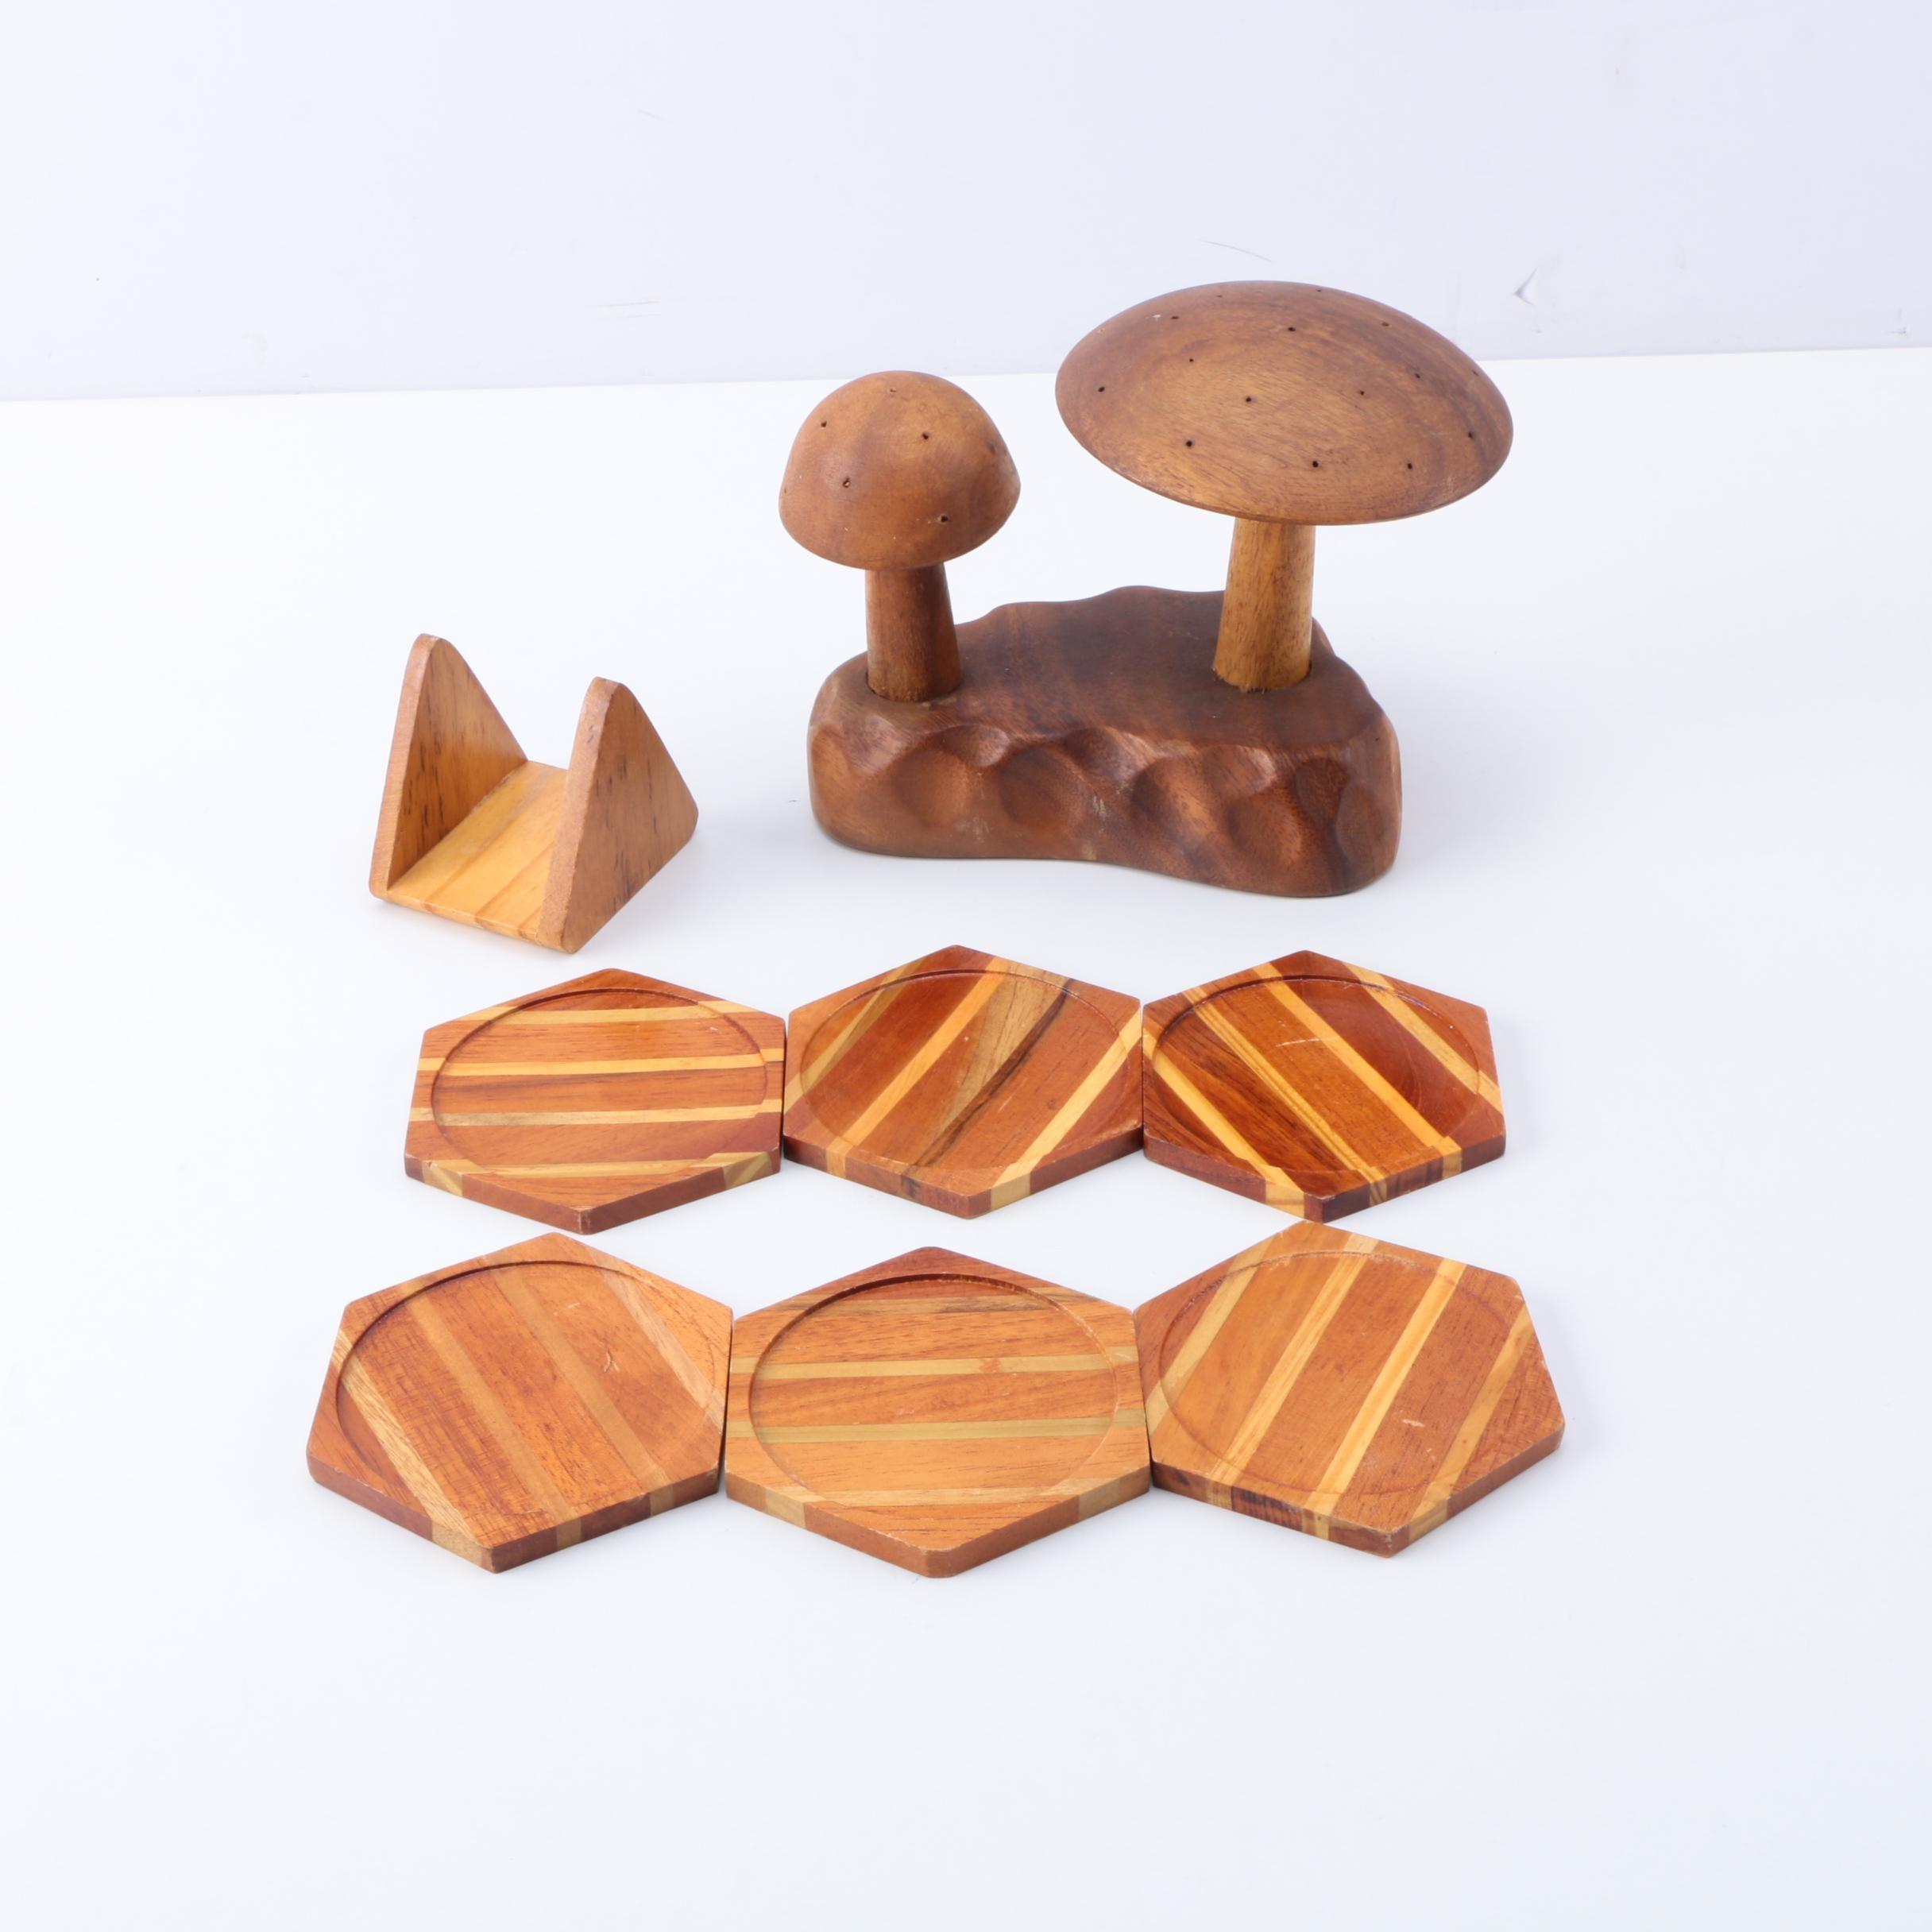 Filipino Carved Rain Tree Mushroom Décor and Wooden Coaster Set